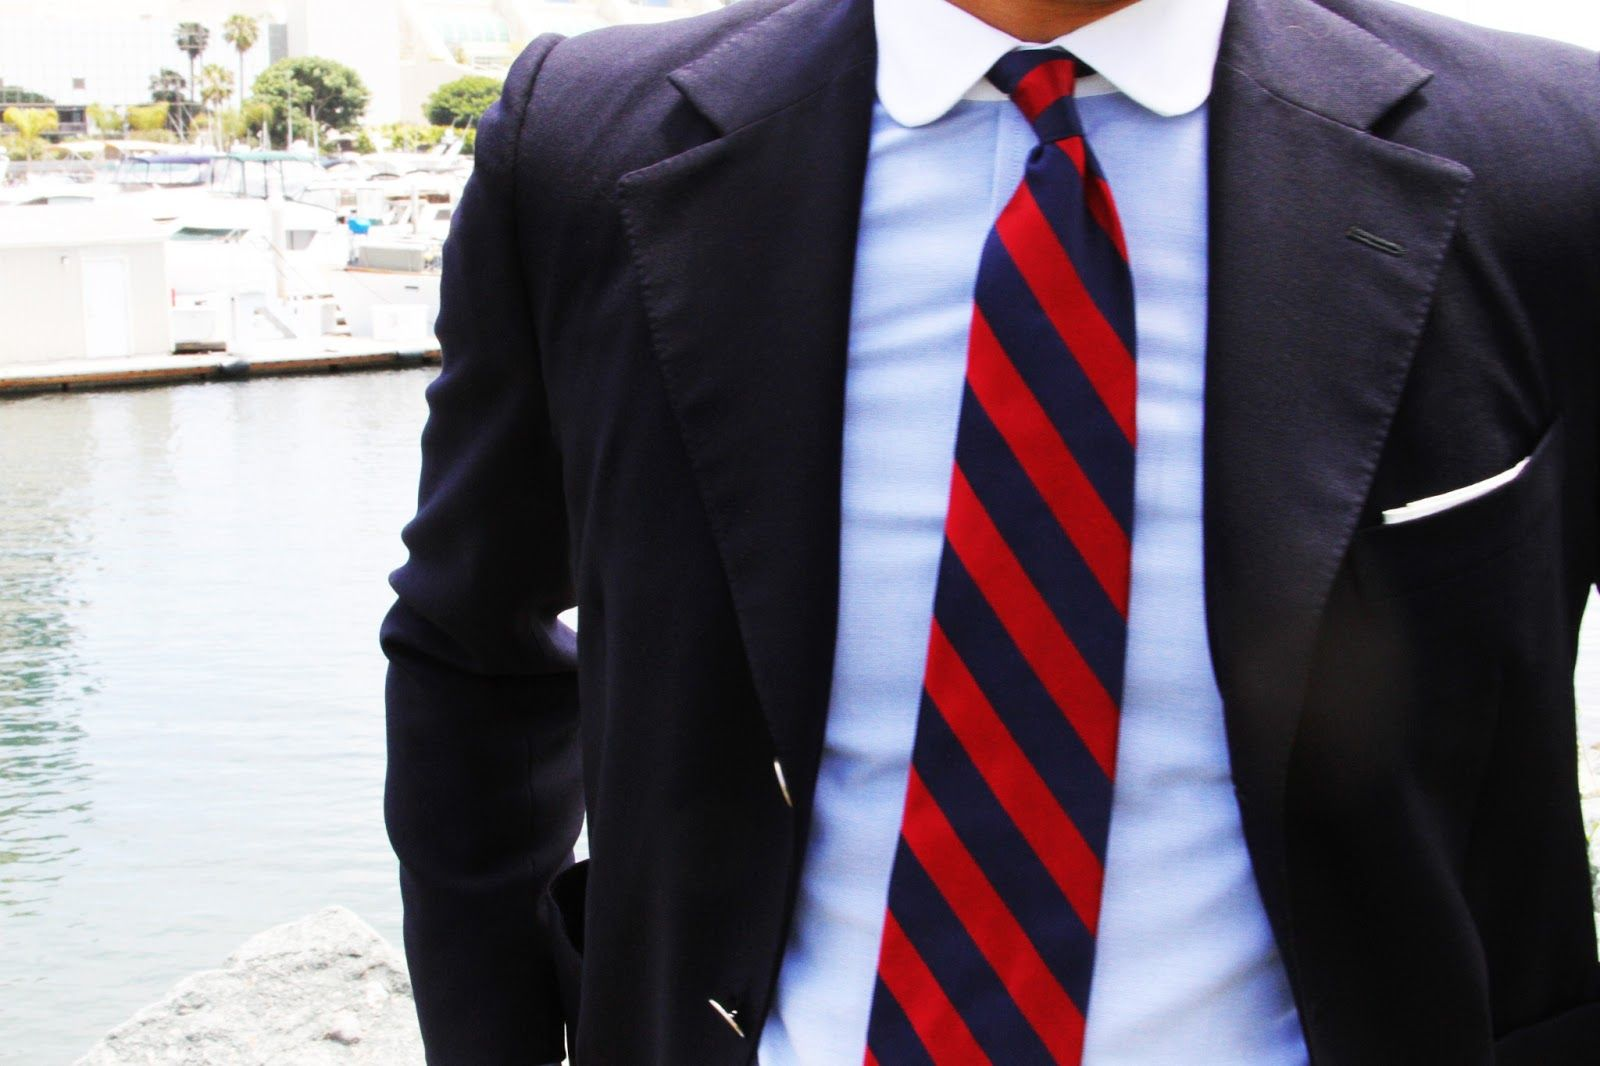 club blazer men - Cerca con Google